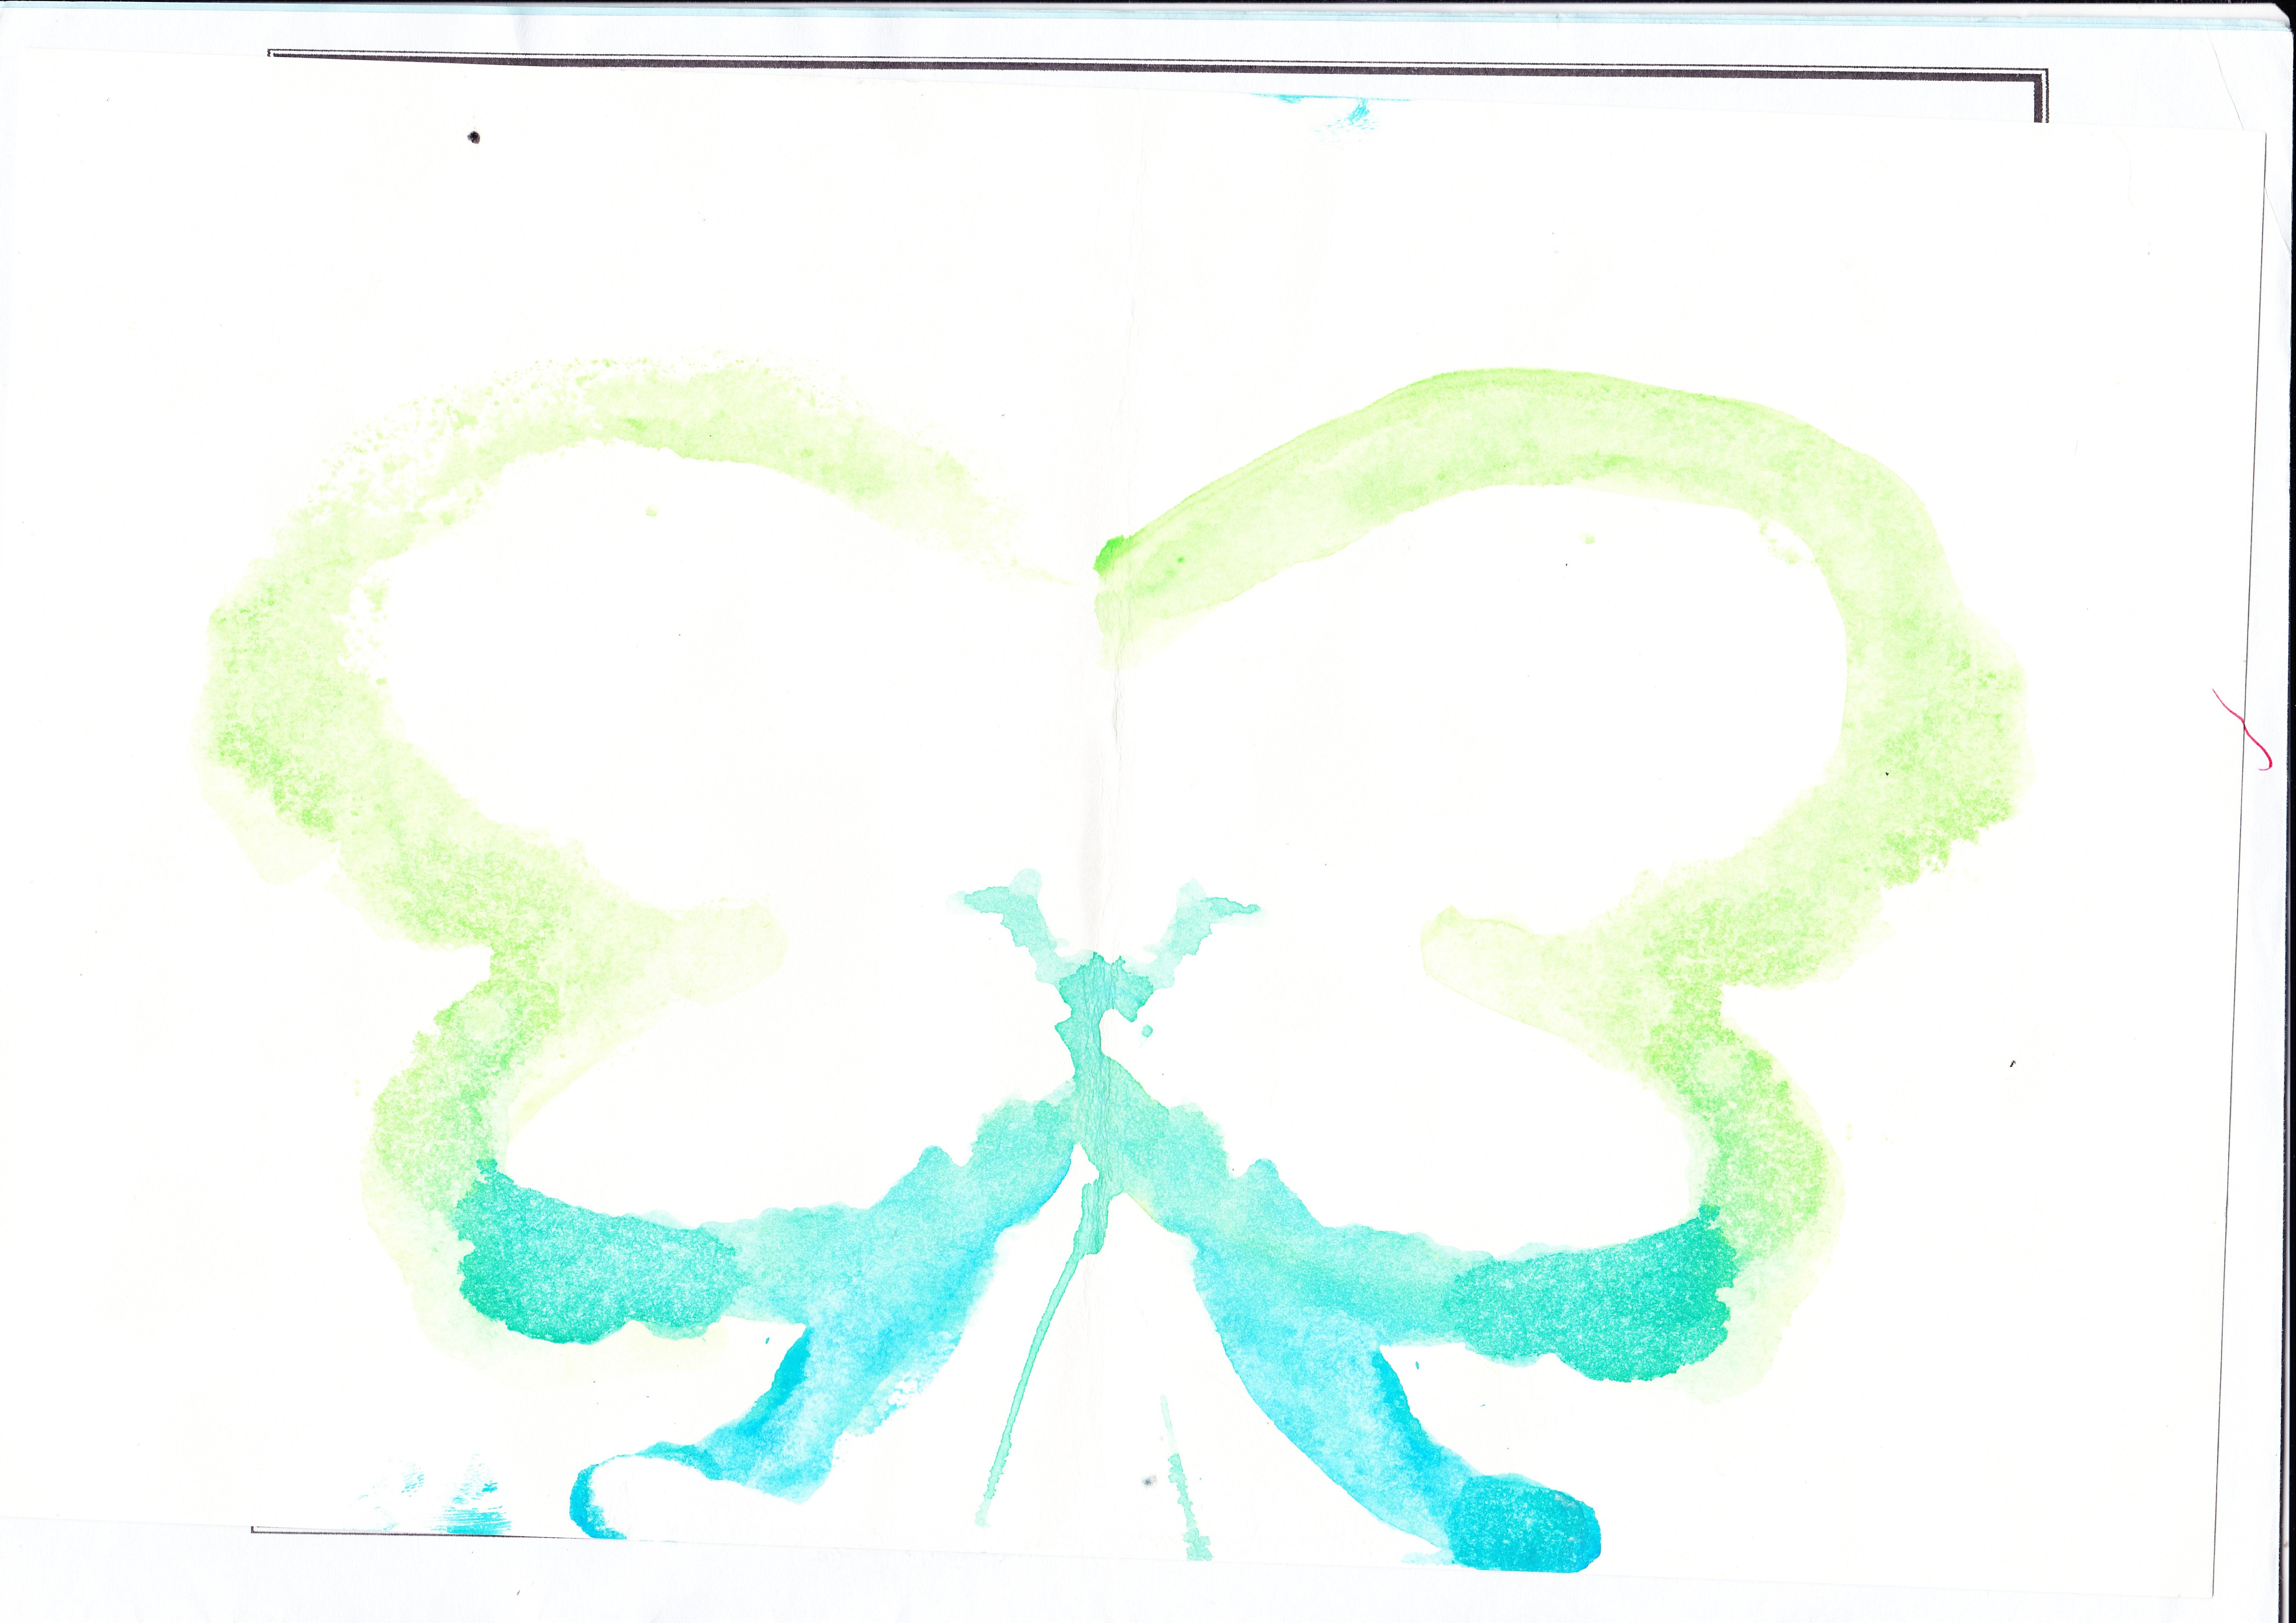 ppt 背景 背景图片 边框 模板 设计 矢量 矢量图 素材 相框 7016_4960